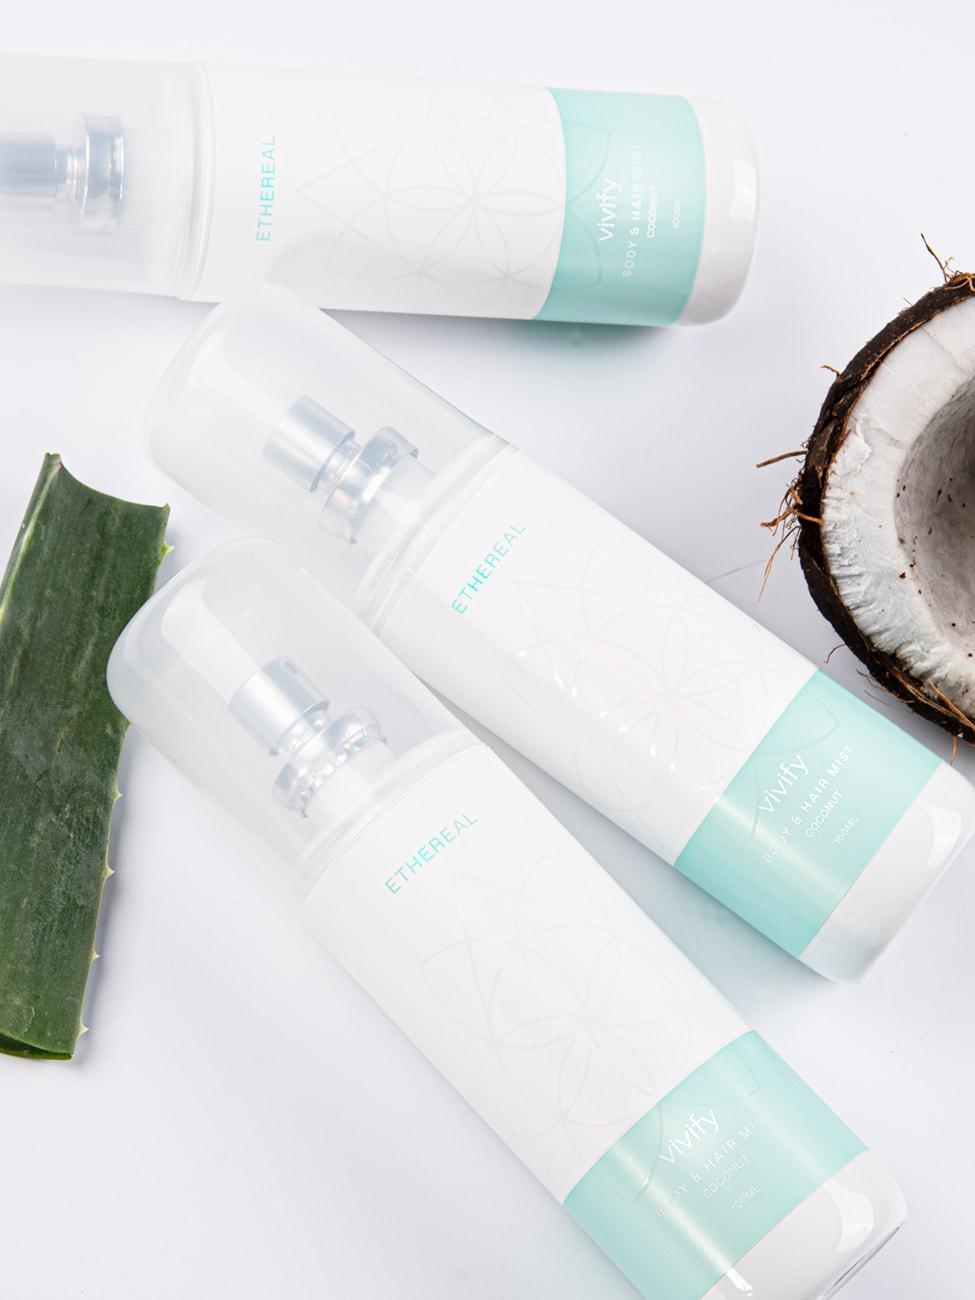 Vivify_mist_comp_Ethereal_Dermocosmetics_Skincare_Handmade_Greek_Products